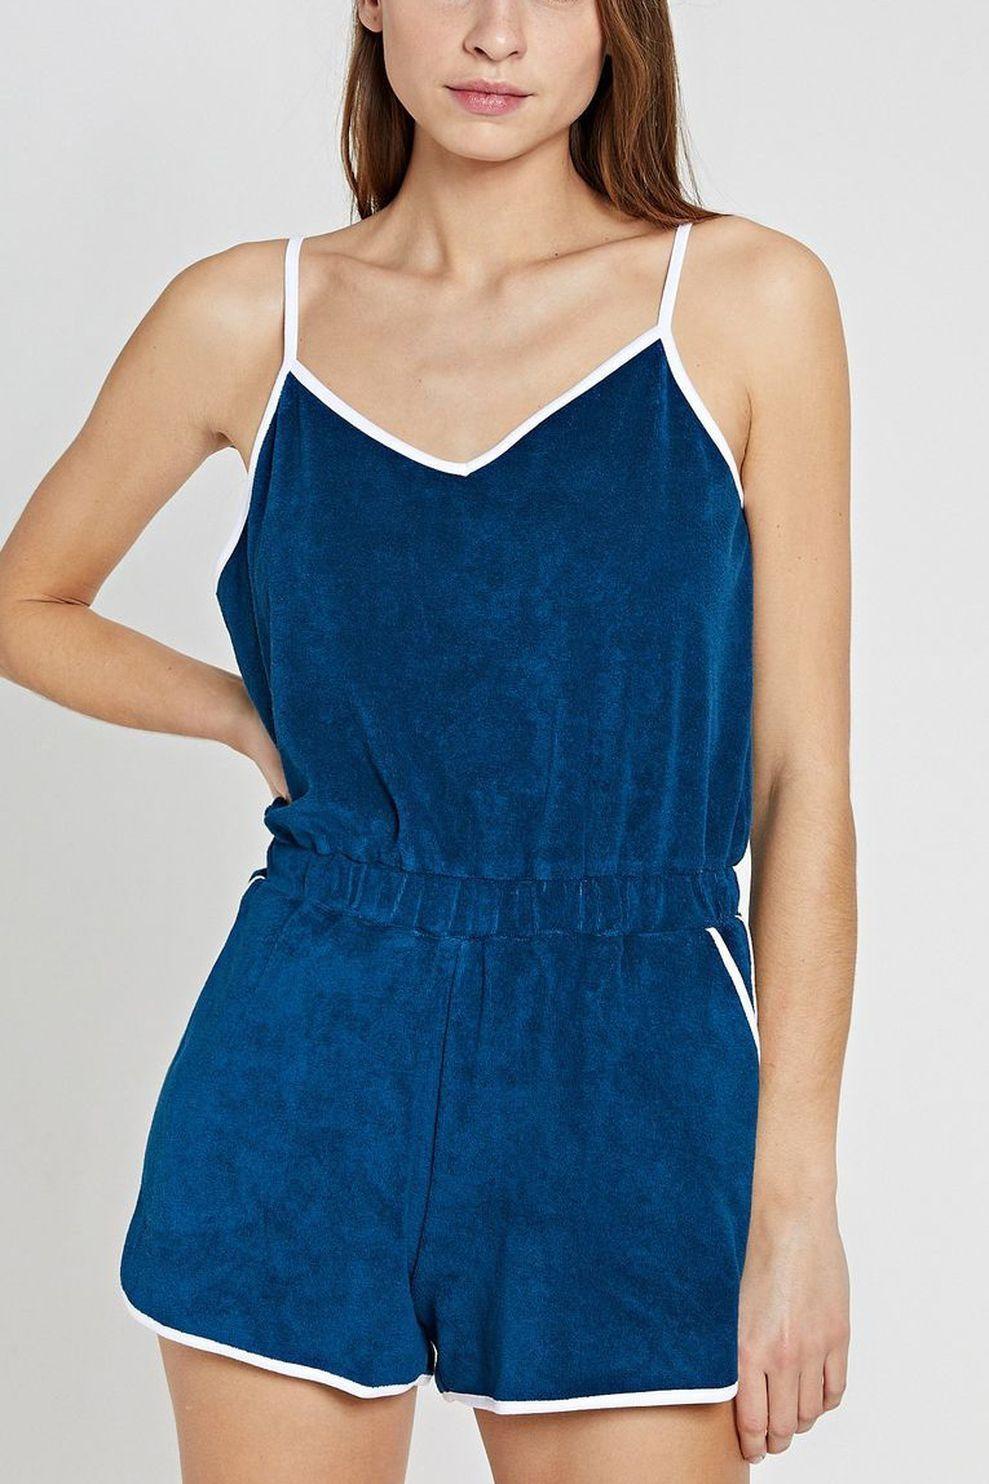 Shiwi Jumpsuit Torino voor dames - Blauw - Maten: S, M, L, XL